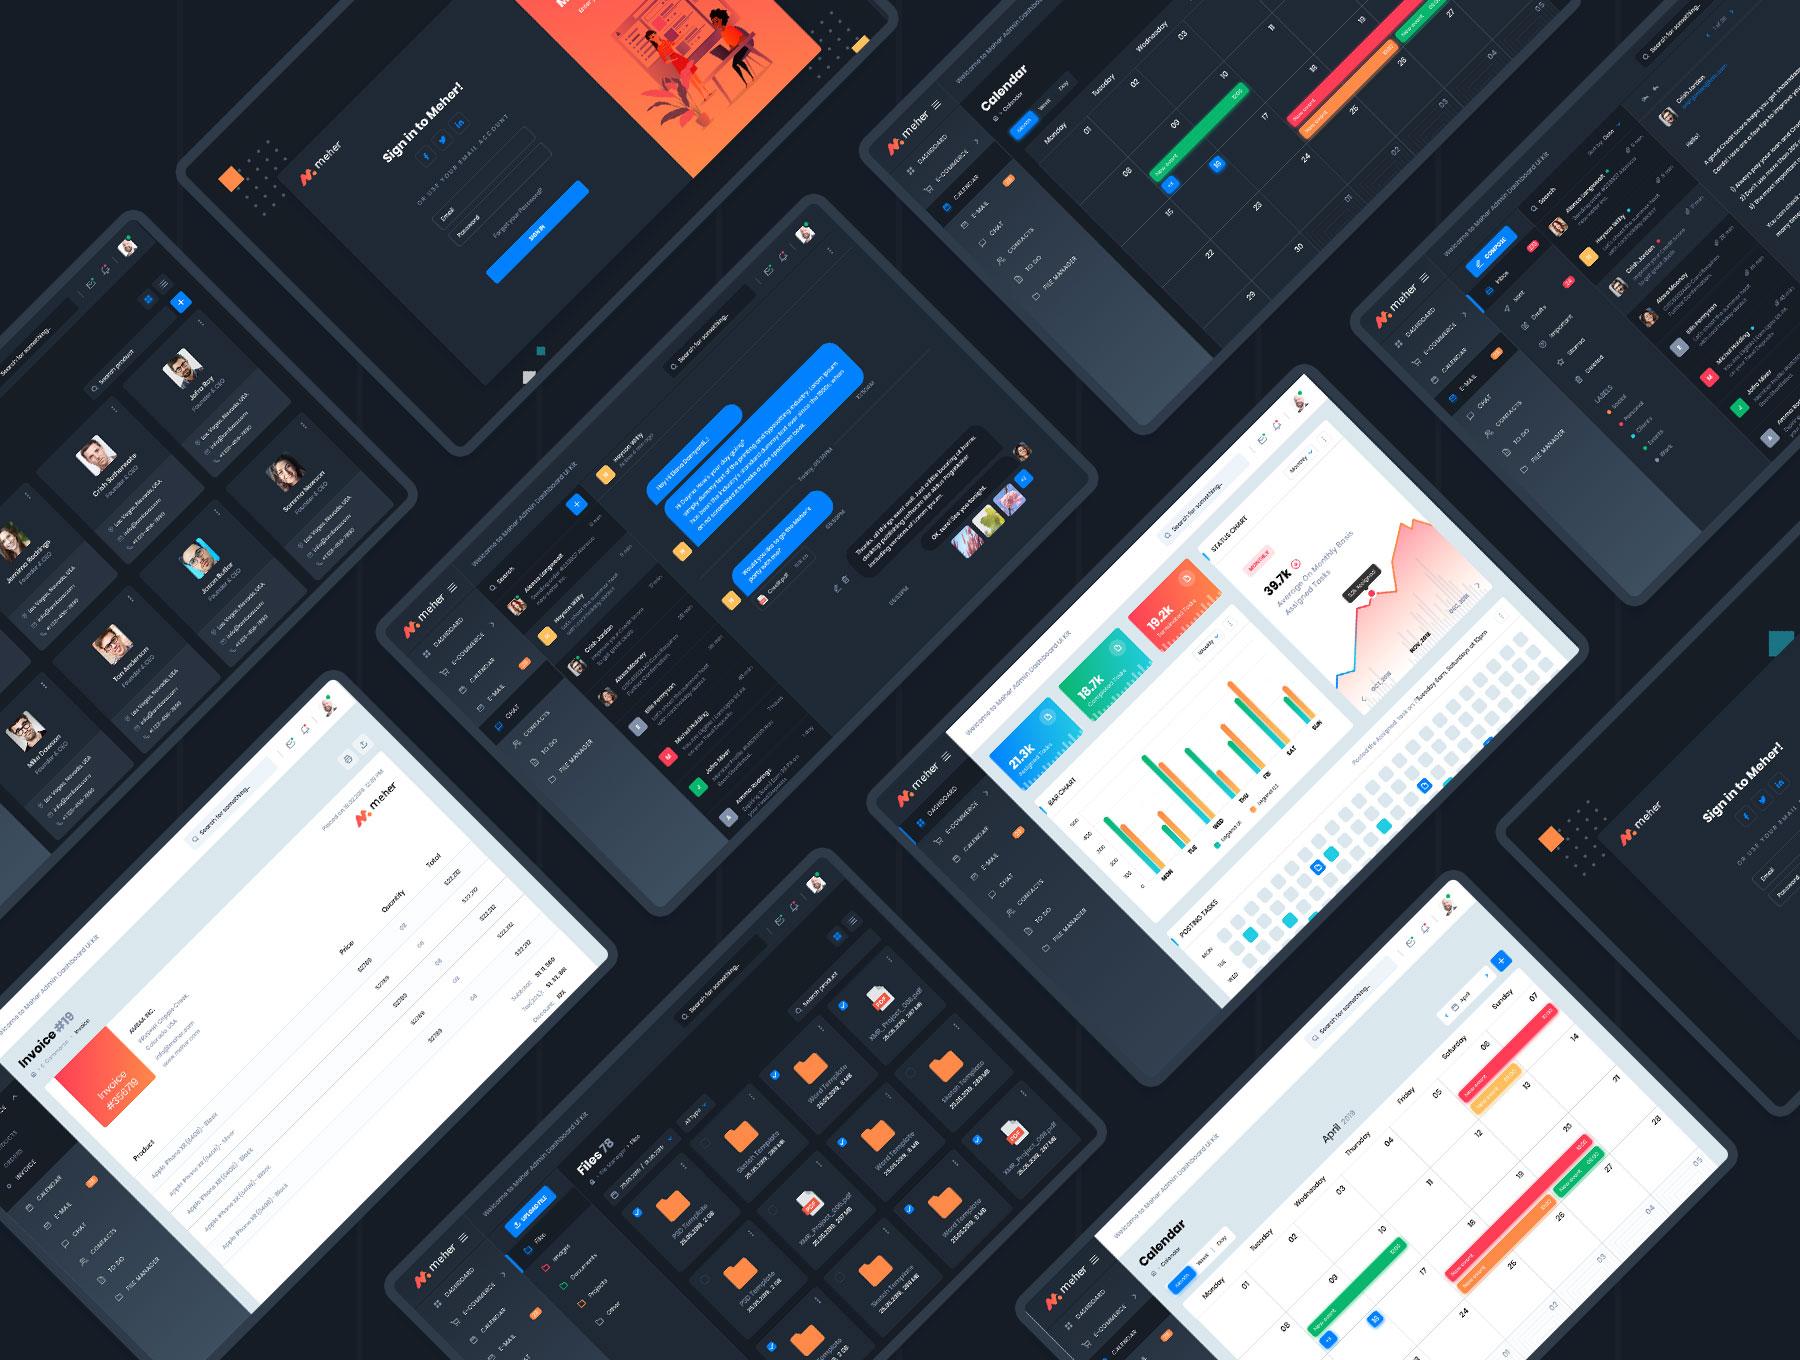 网站后台管理仪表板UI界面设计Sketch模板 Meher – Admin Dashboard Ui Kit Sketch Template插图(1)